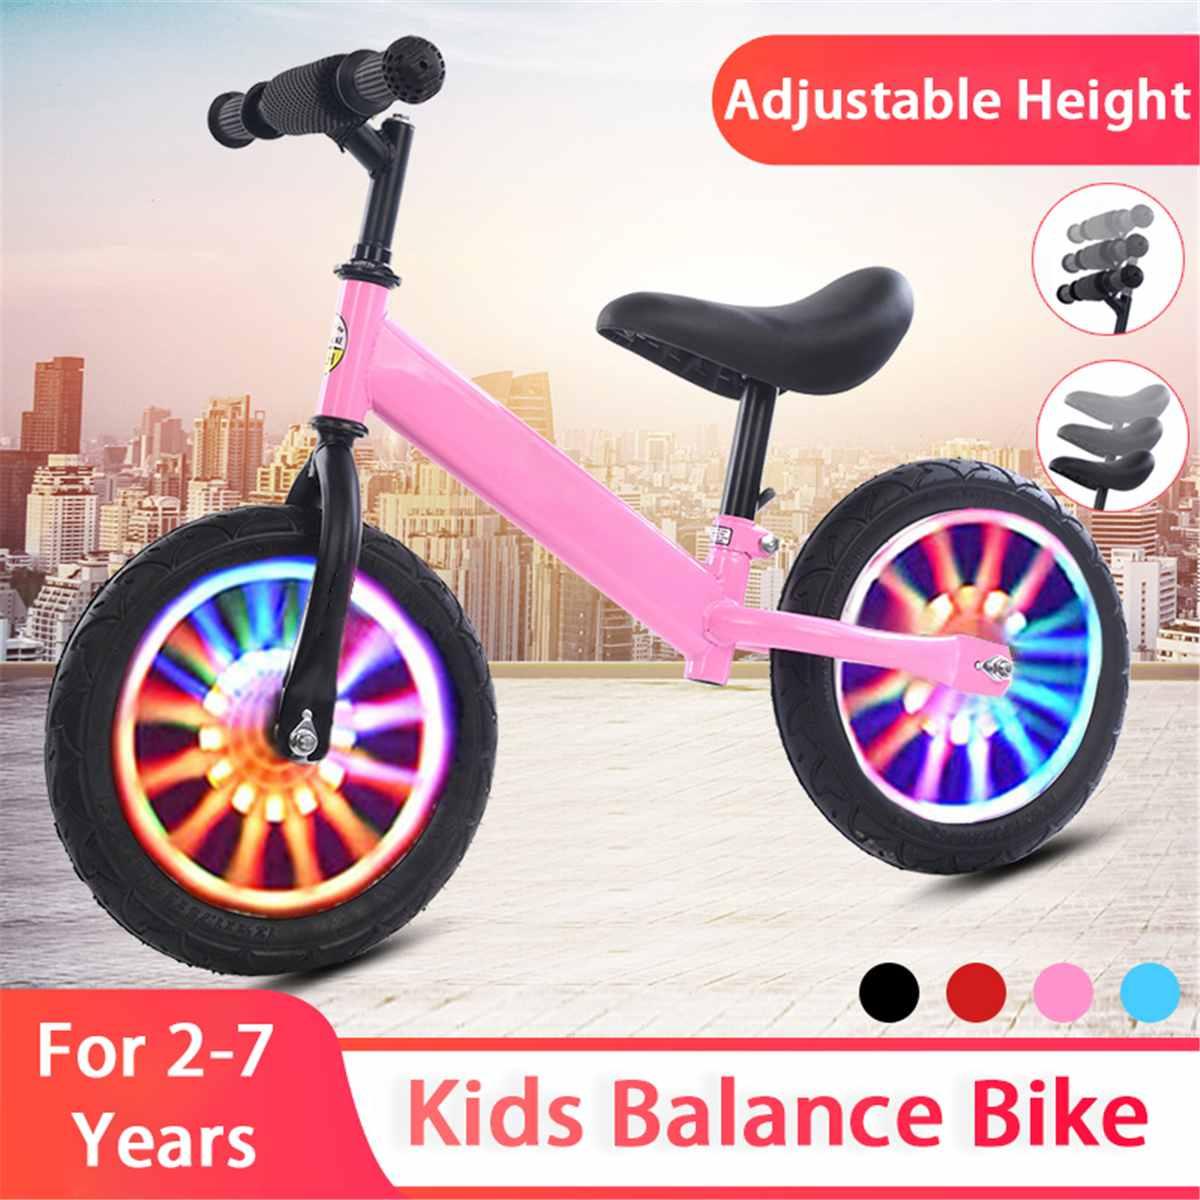 16 Inch Kids Balance Bike Children Toddlers Training Bicycle 3-6 Years Kids Learn to Ride Balance Bike Adjustable Height Gifts